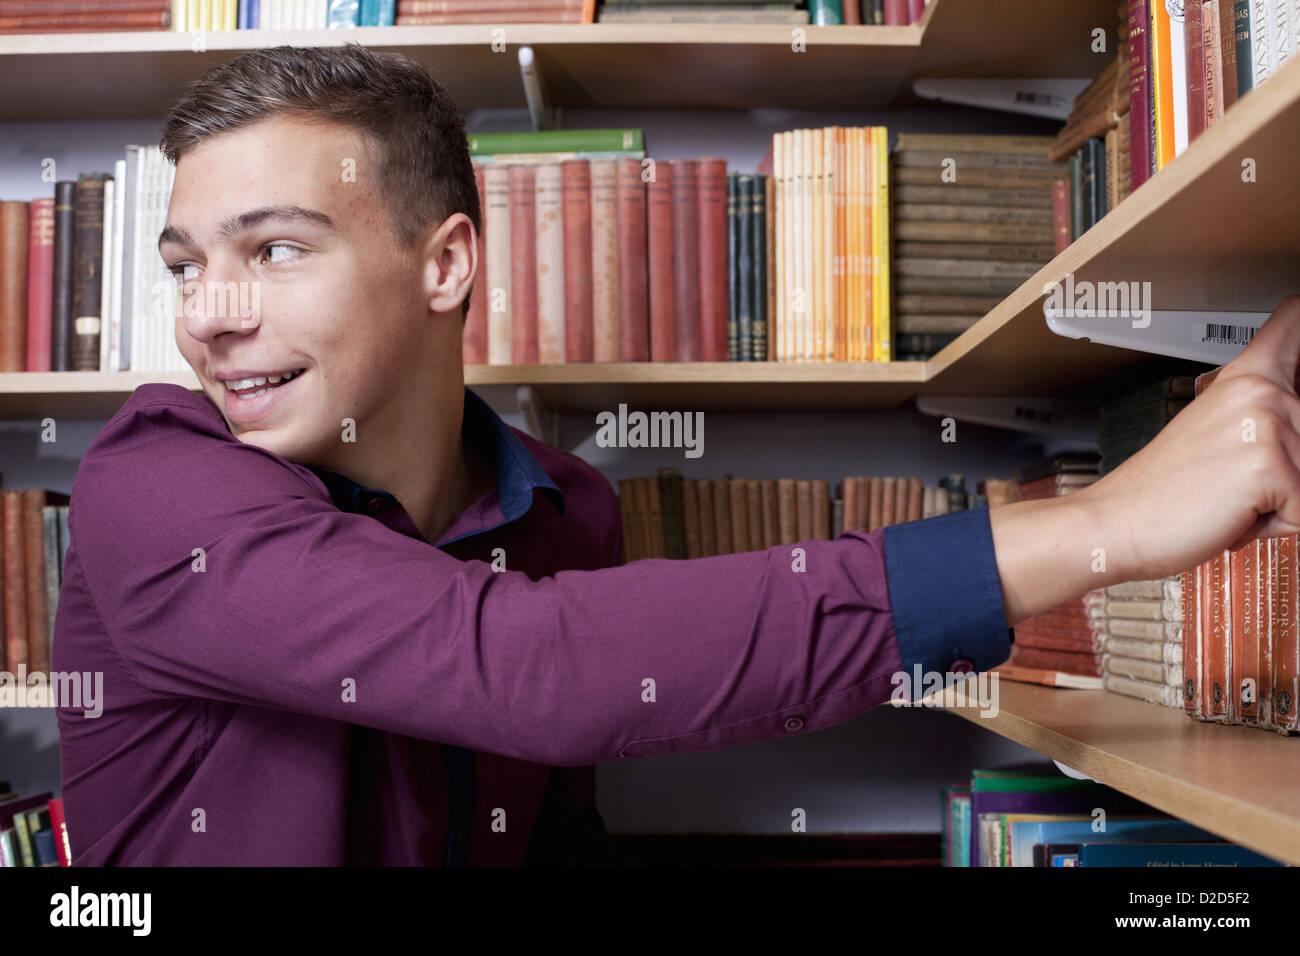 Student pulling books from bookshelf - Stock Image